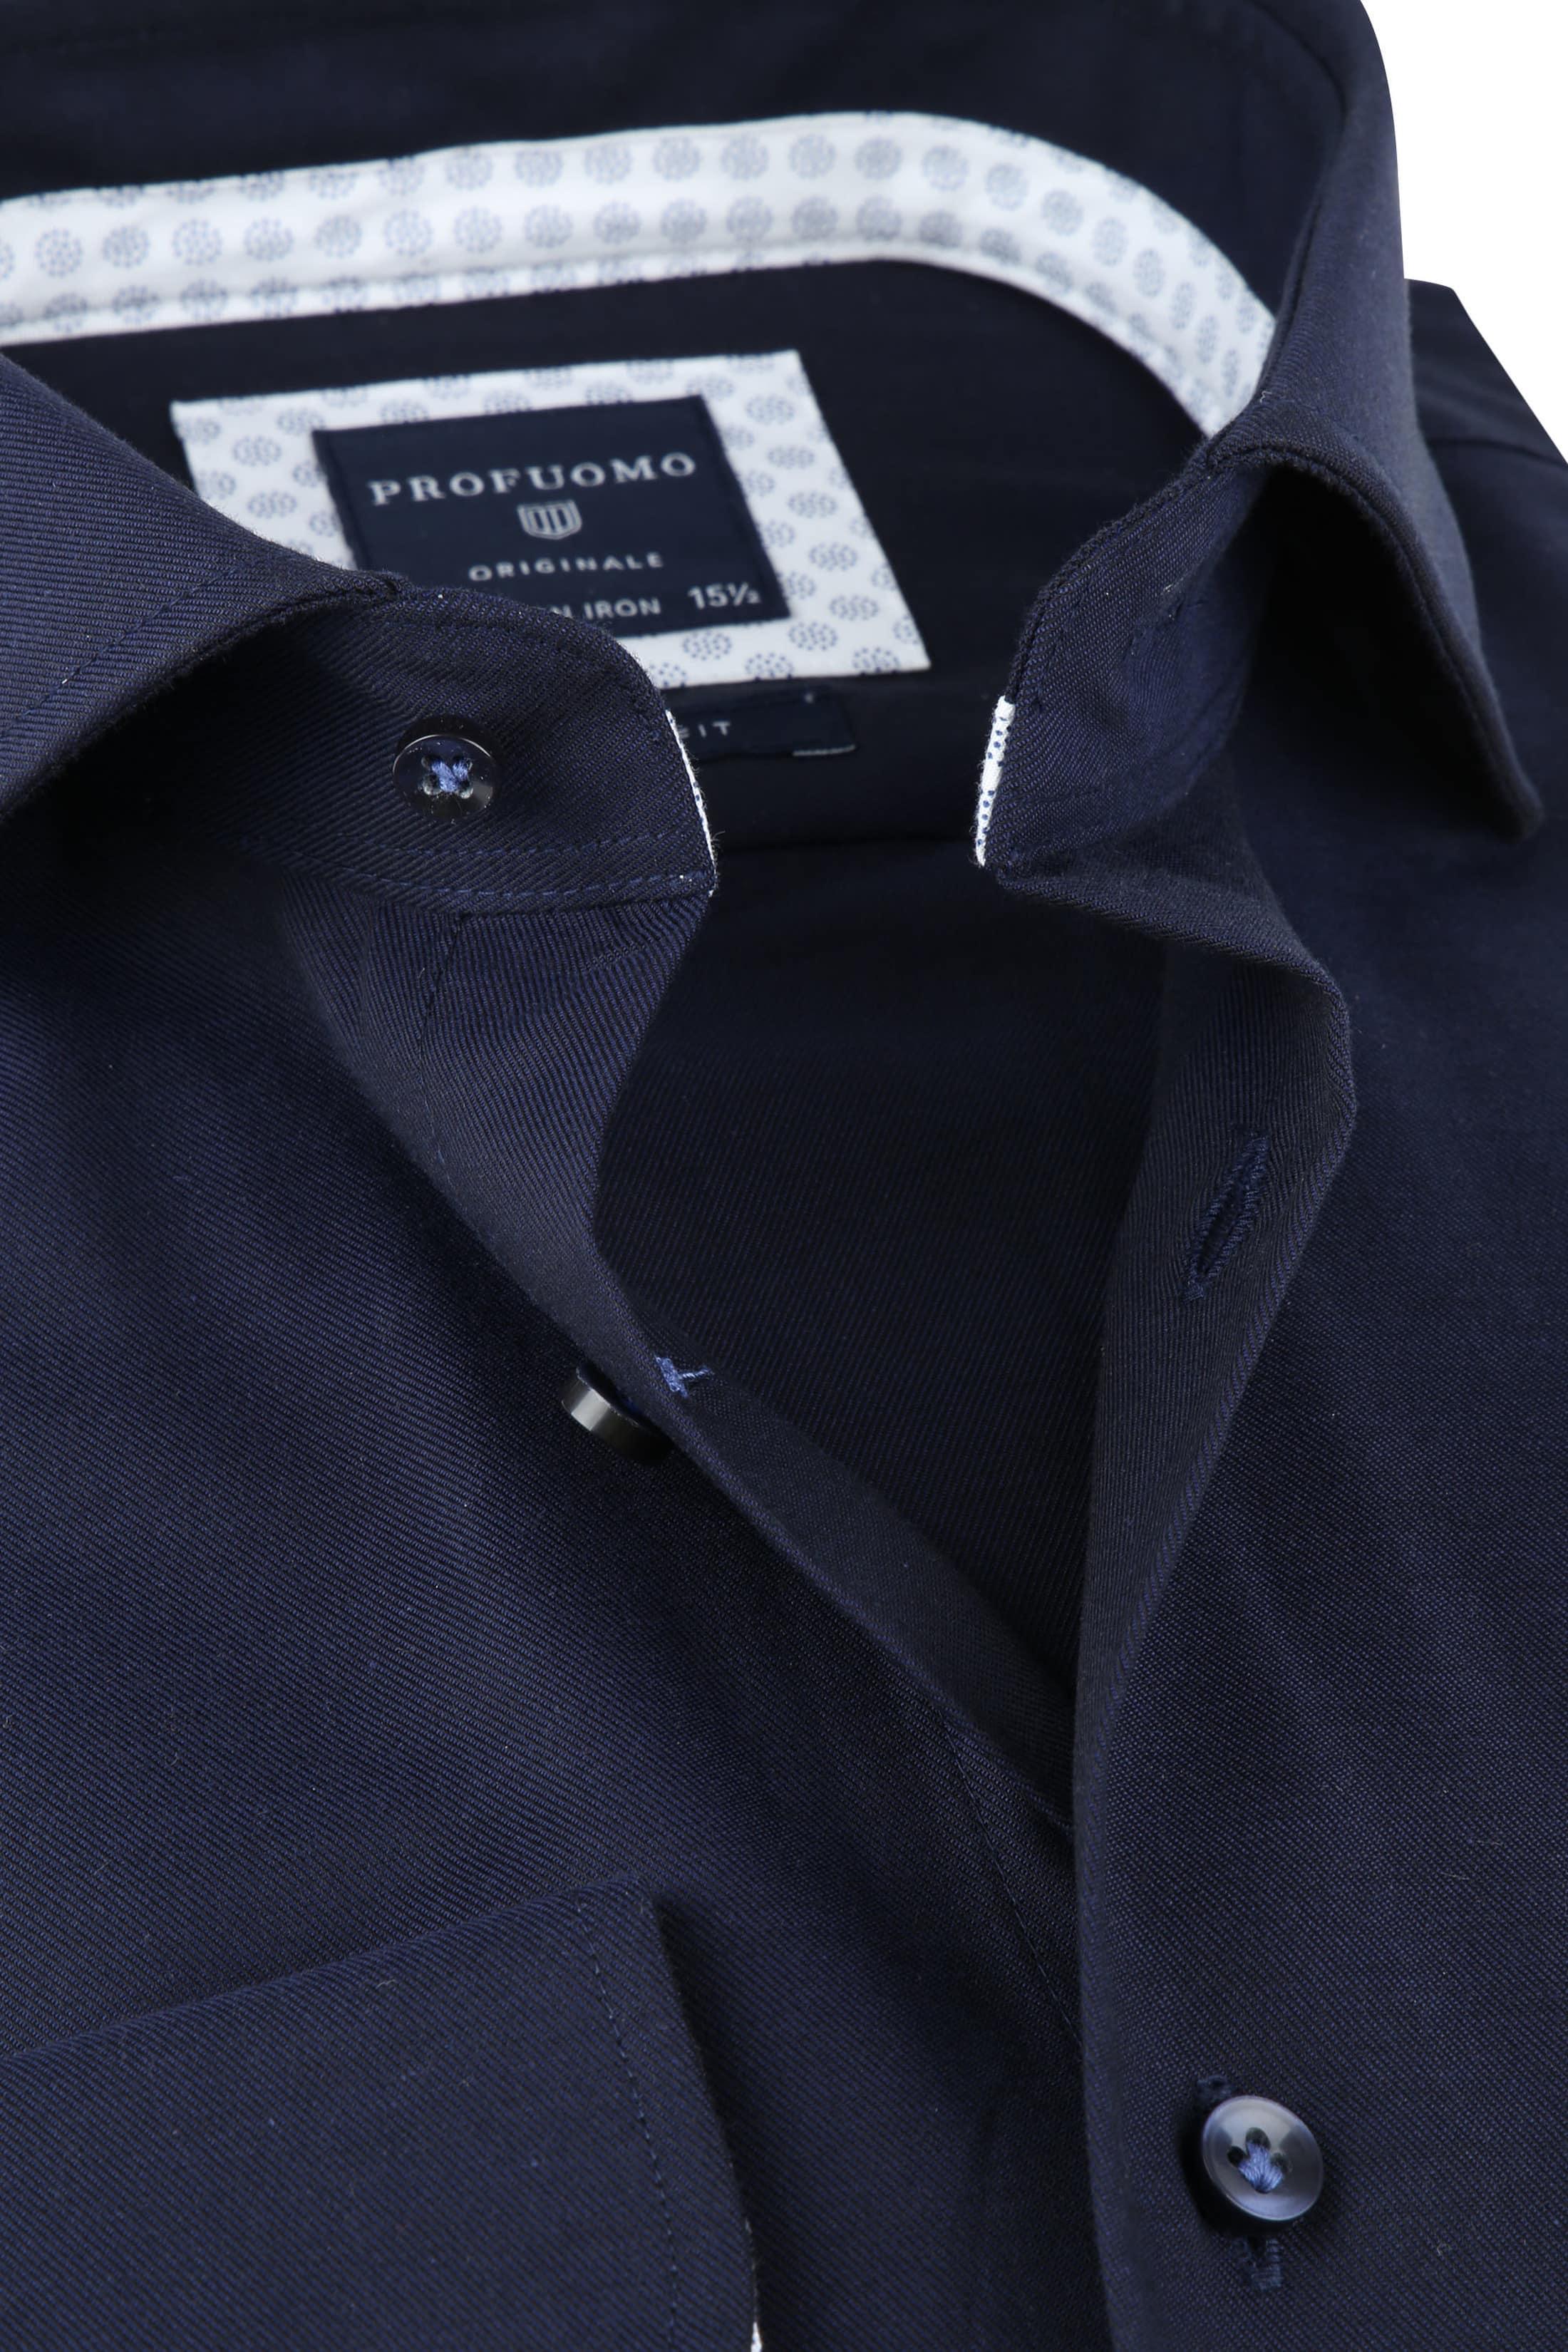 Profuomo SF Overhemd Donkerblauw foto 1